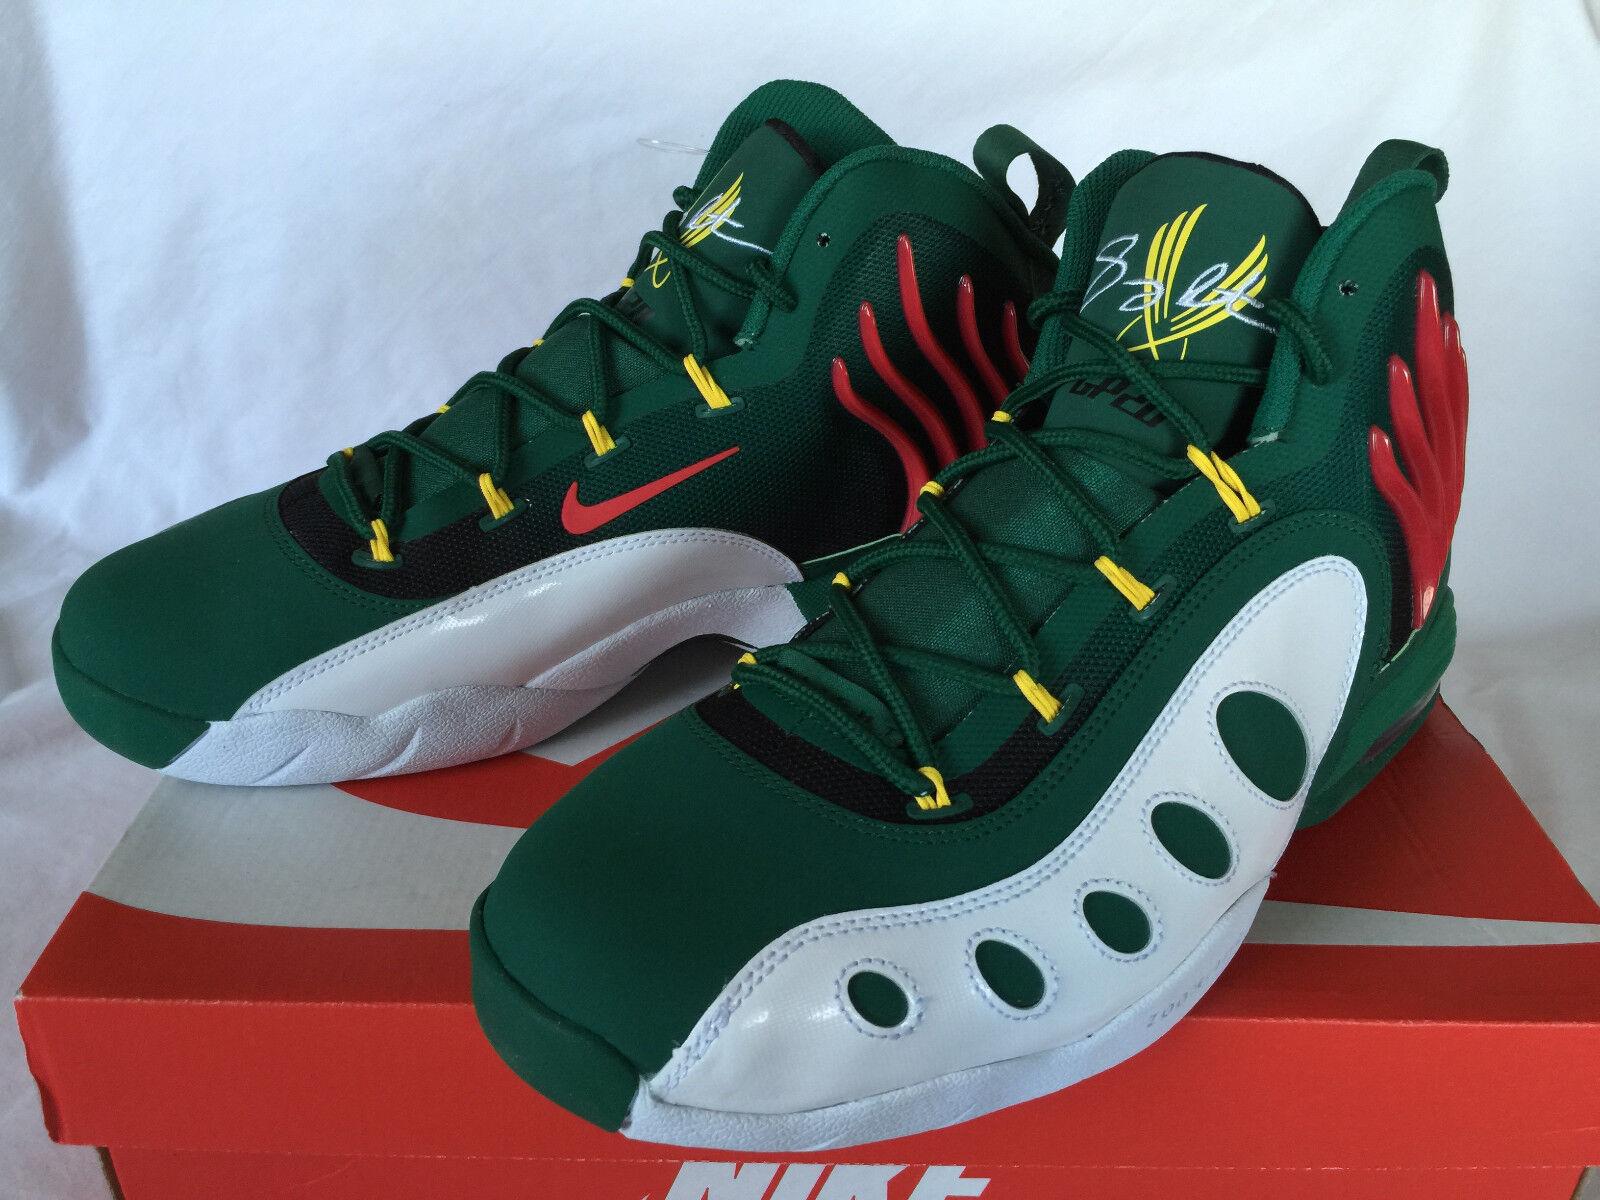 Nike sonic volo supersonics 641333-300 payton, scarpe da basket nba nuovi uomini 9